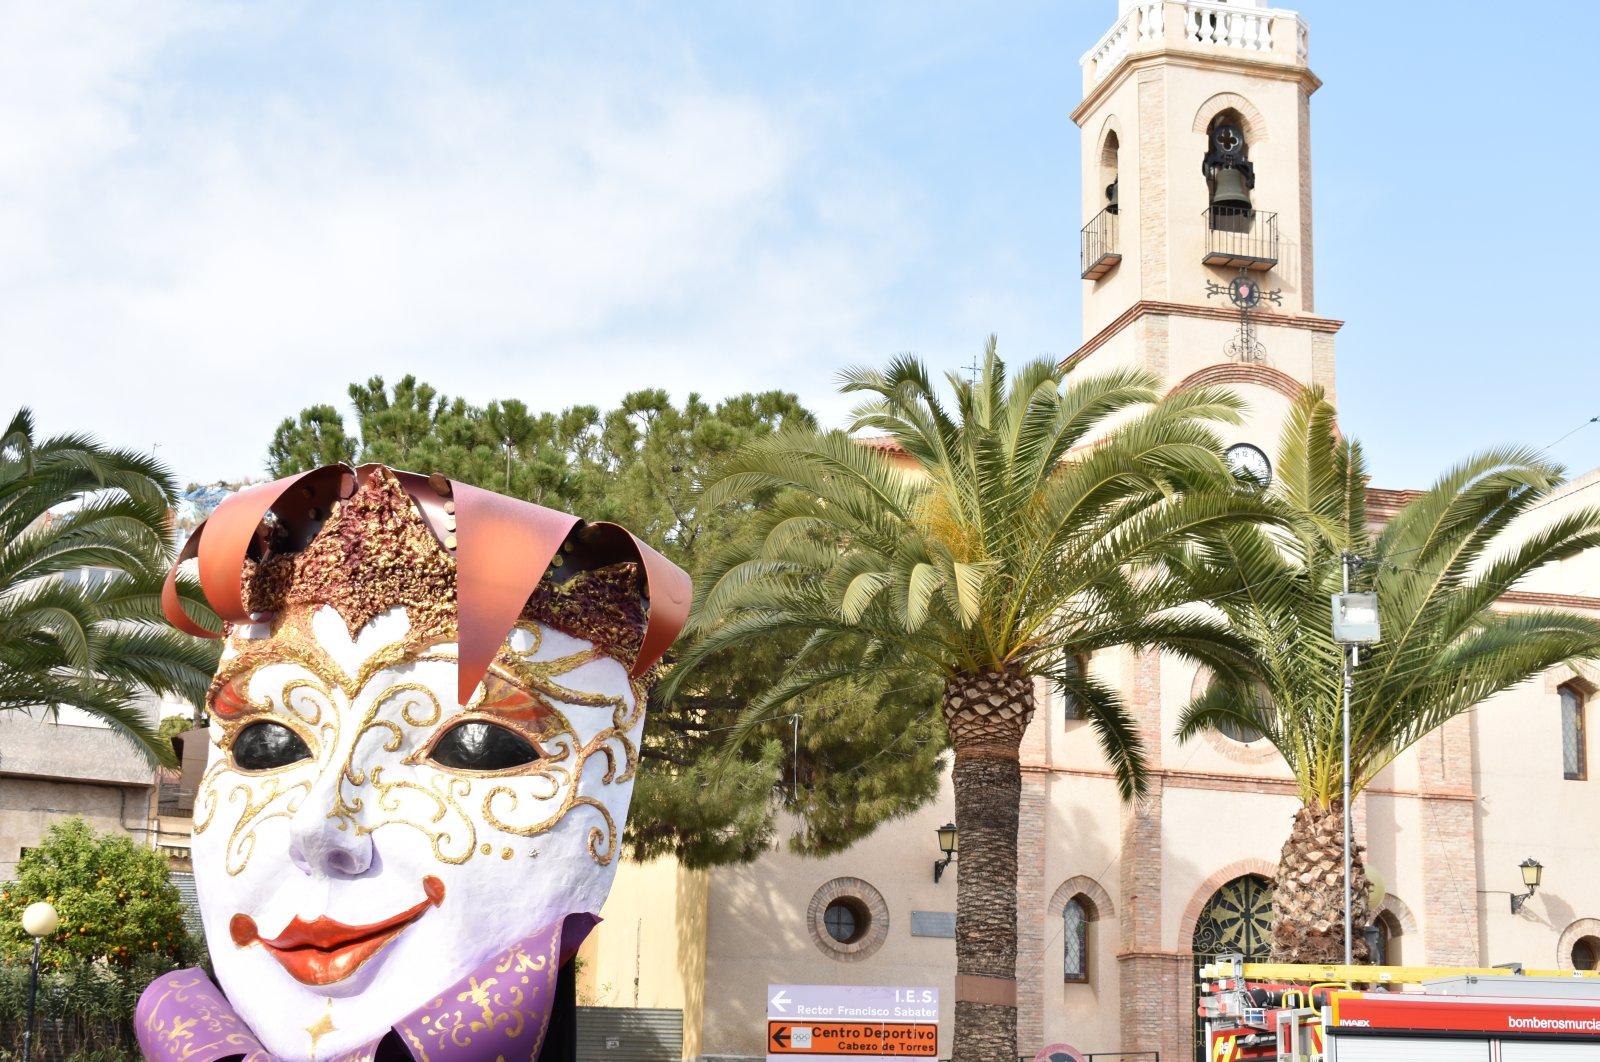 Popular carnival in Cabezo de Torres, Murcia, Spain, Feb. 29, 2020. (Shutterstock Photo)